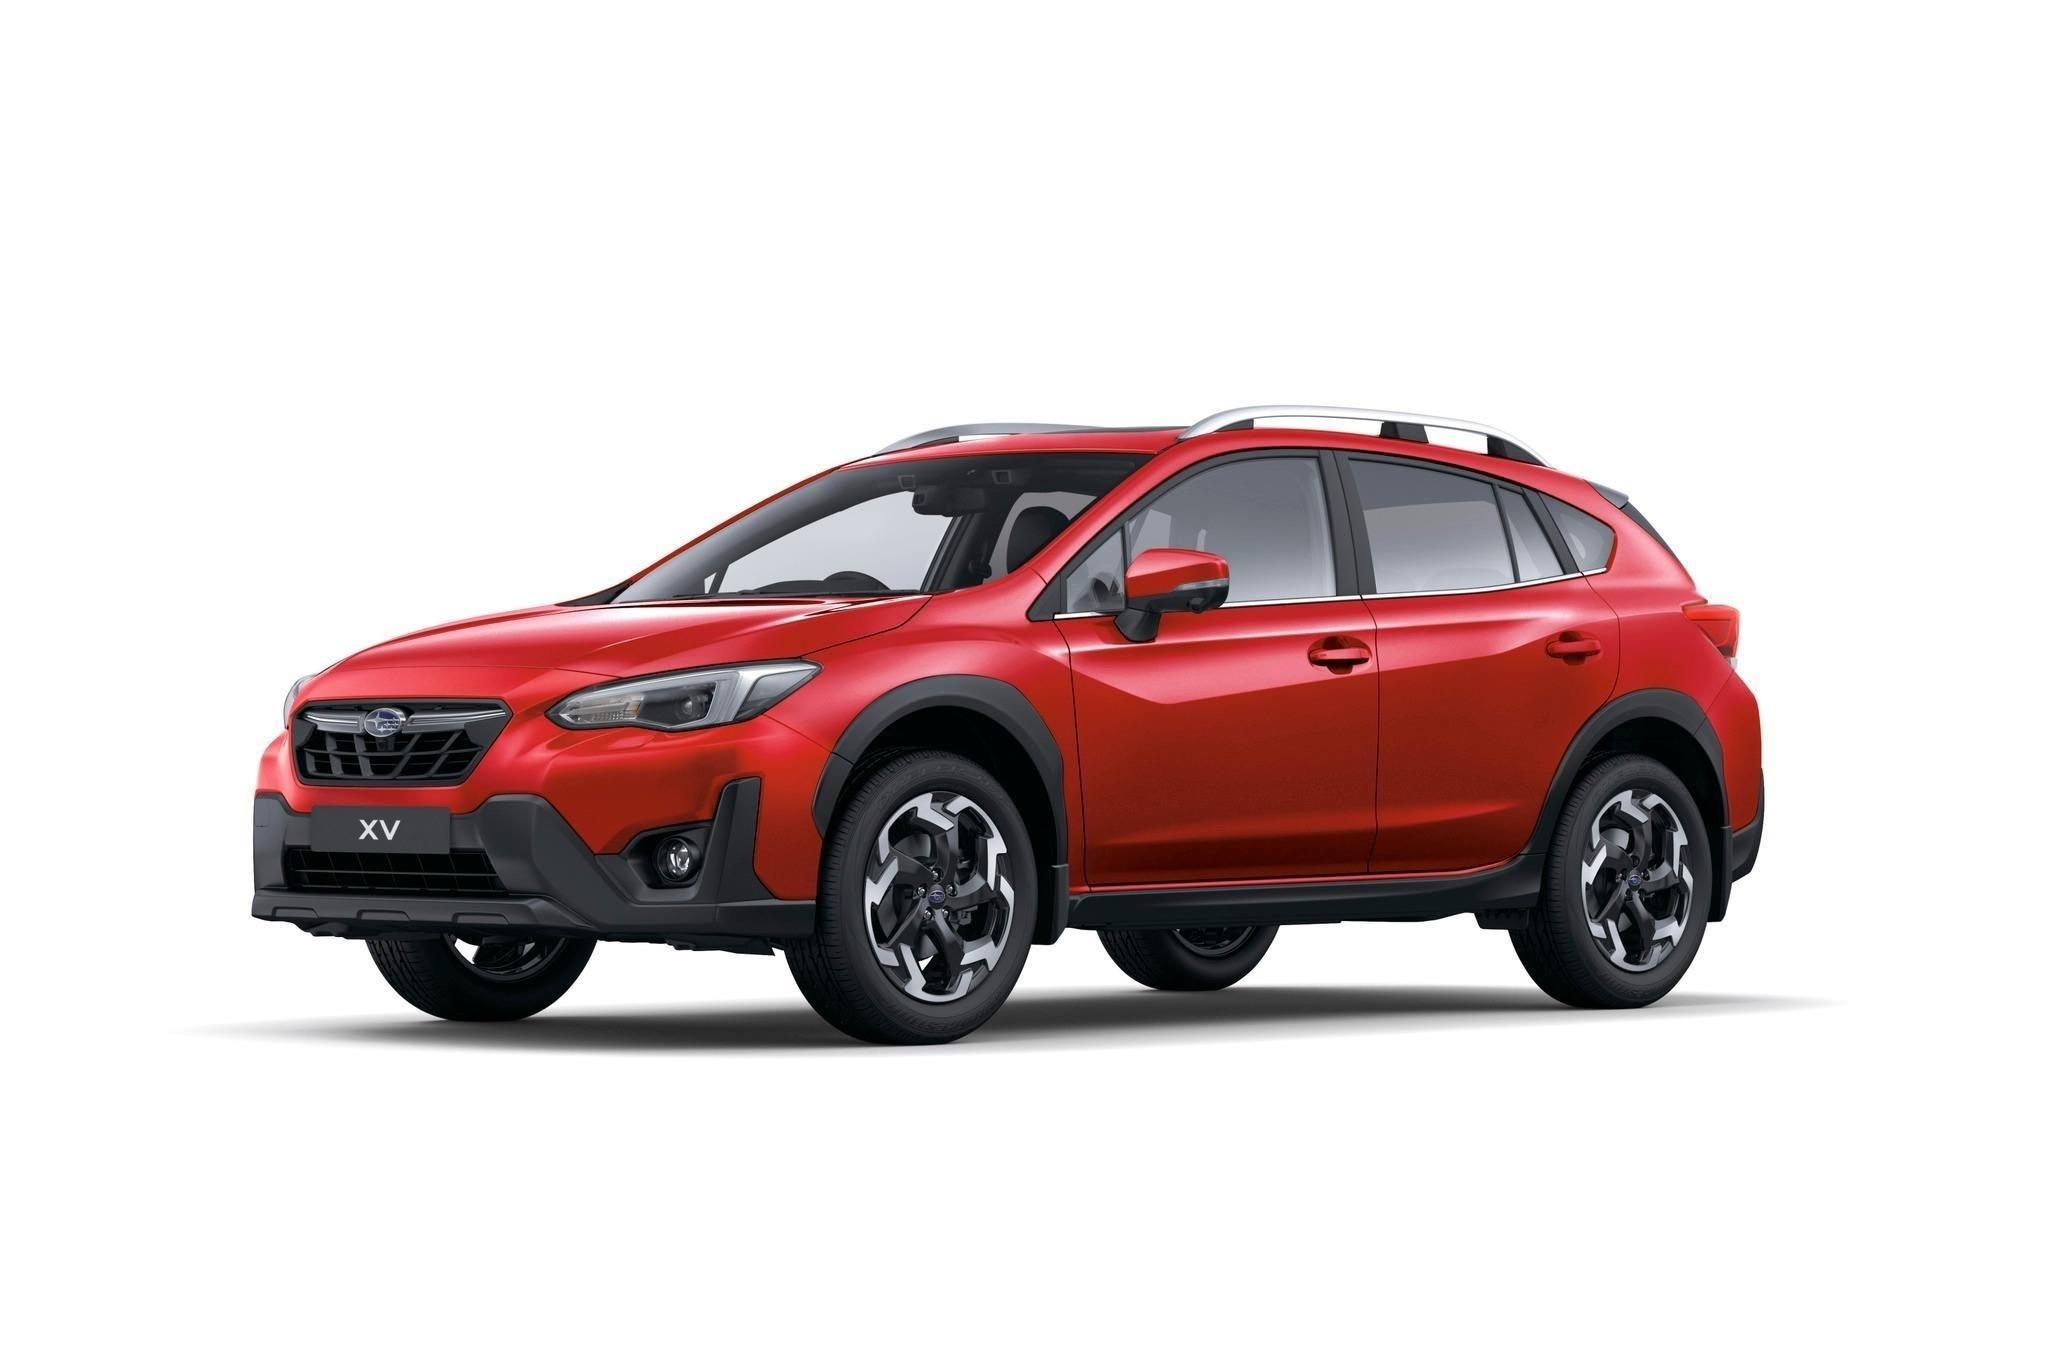 2021 Subaru XV 2.0i-S AWD MY21 / Automatic (CVT) / Wagon / 2.0L / 4 Cylinder / Petrol / 4x4 / 4 door / Model Year '21 October release 08J221